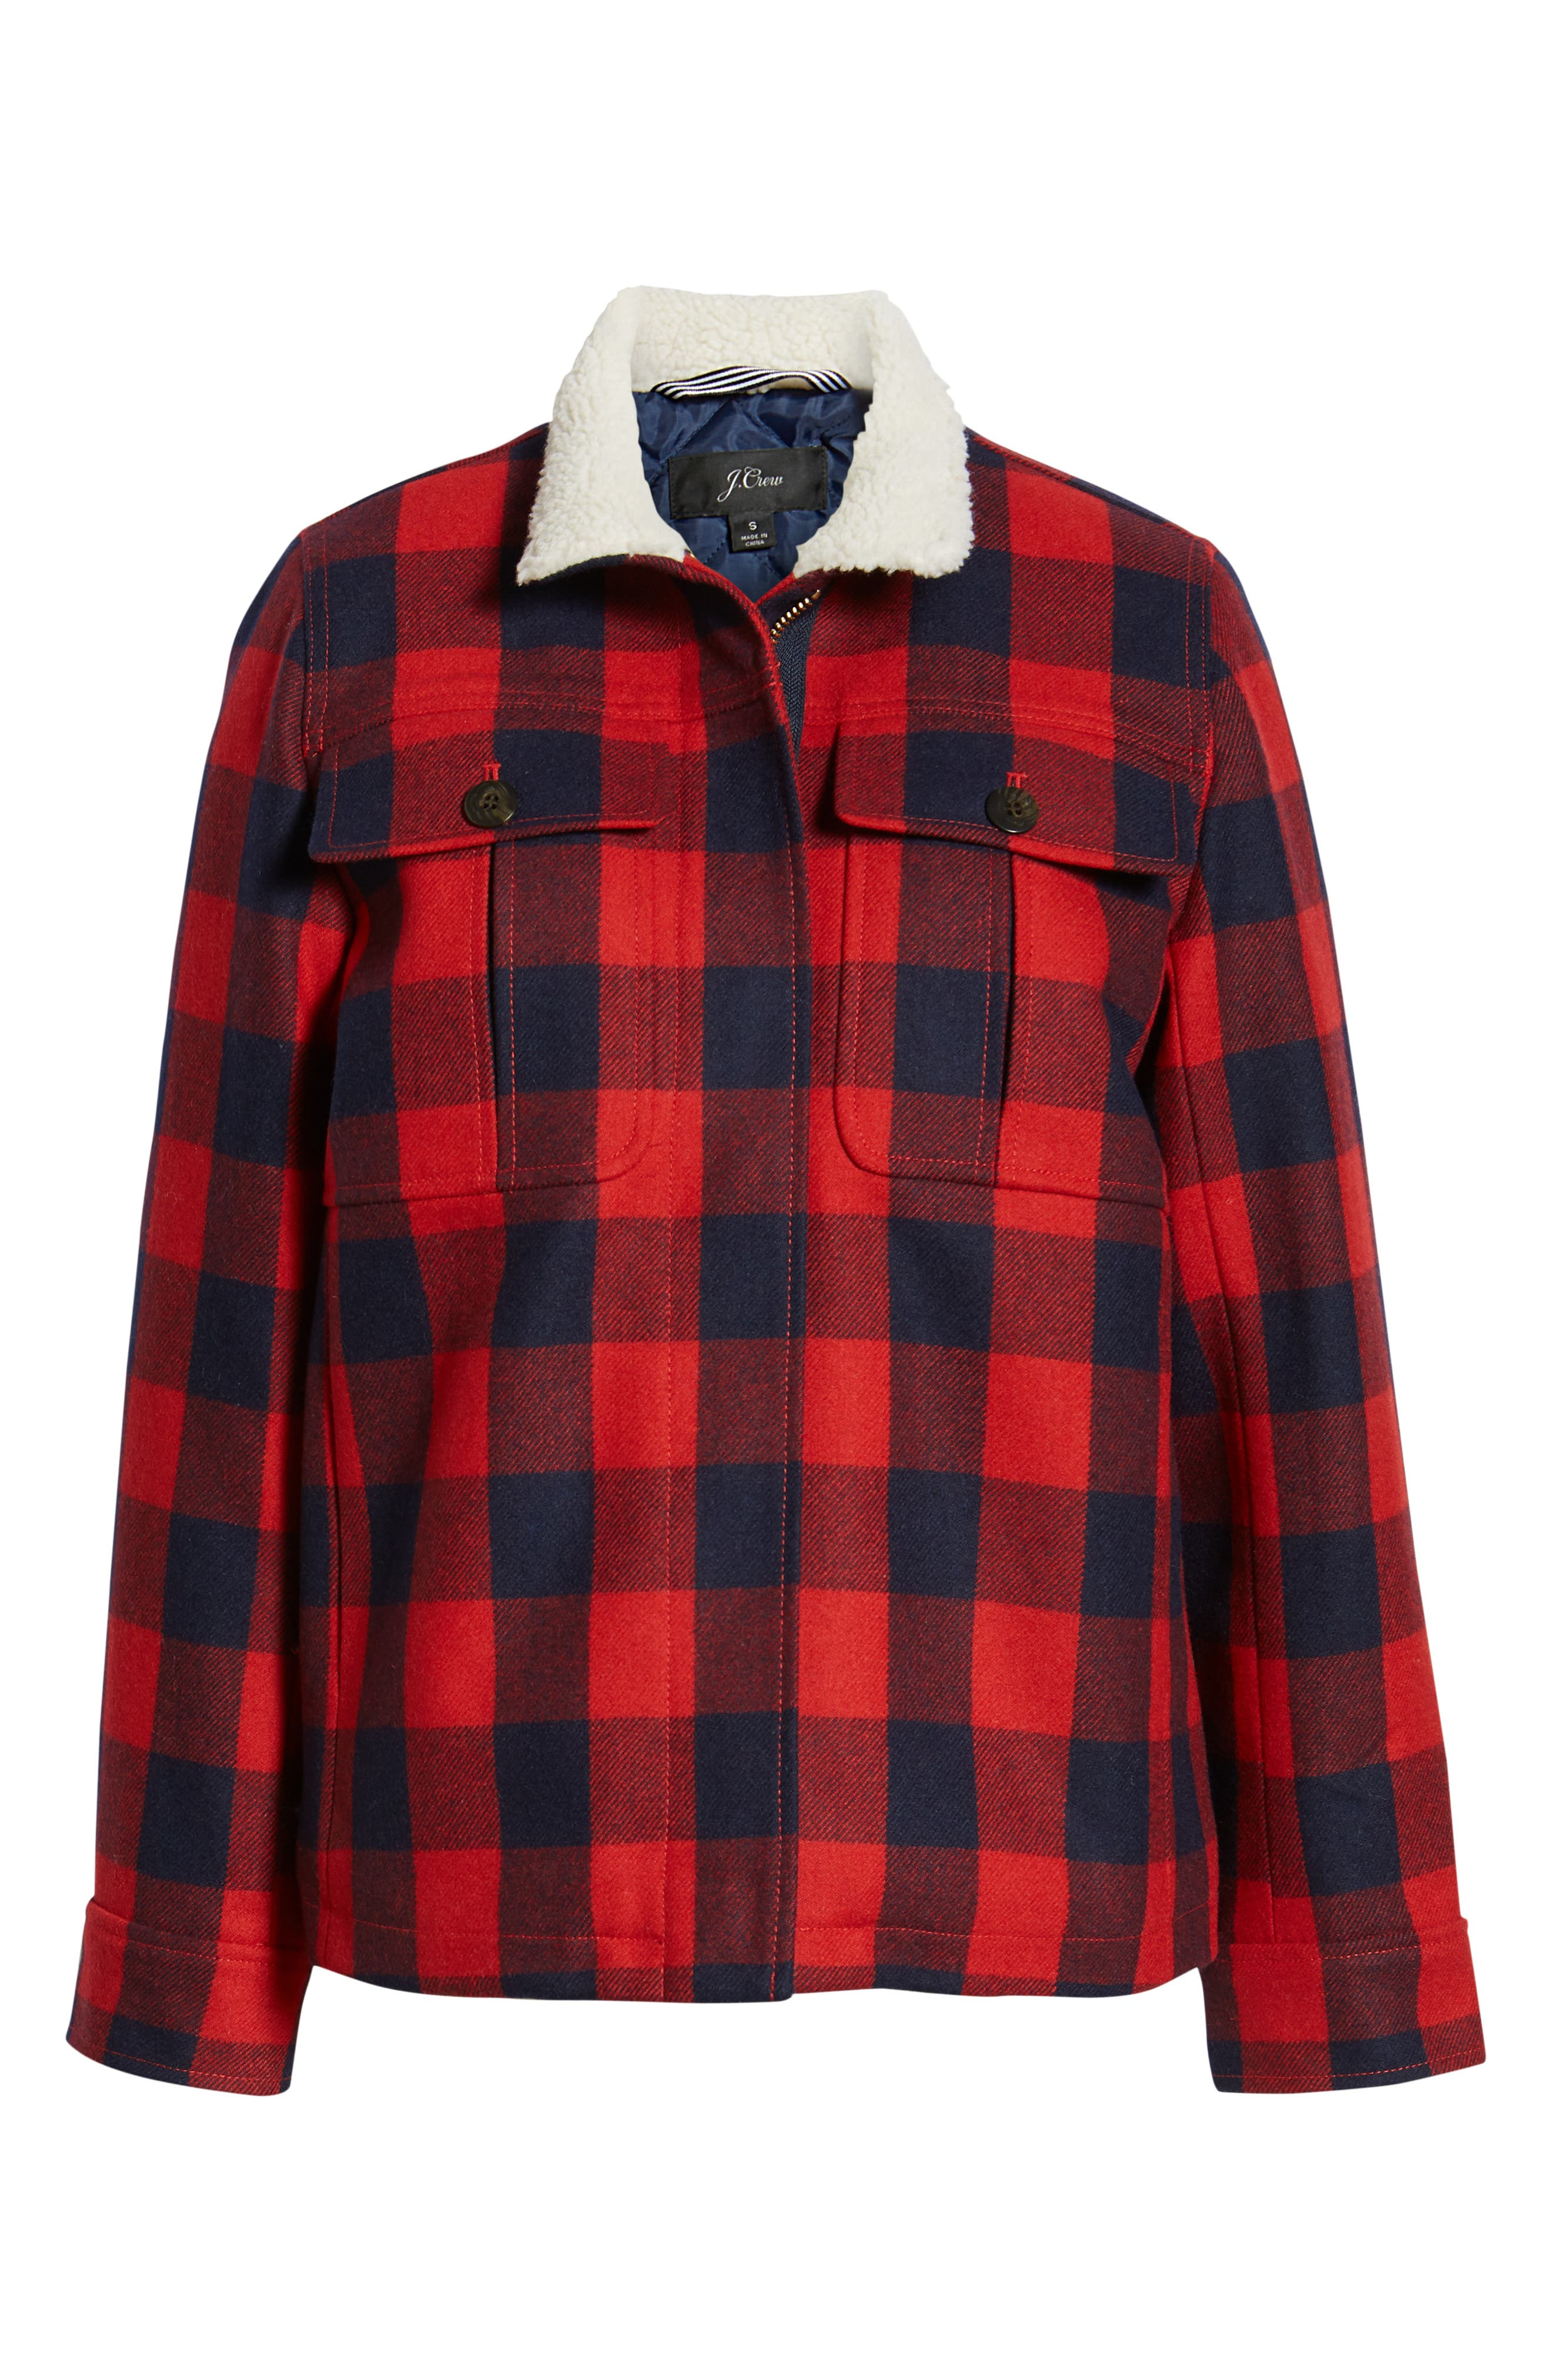 Buffalo Check Workwear Jacket with Faux Shearling Lining,                             Alternate thumbnail 6, color,                             RED NAVY BUFFALO